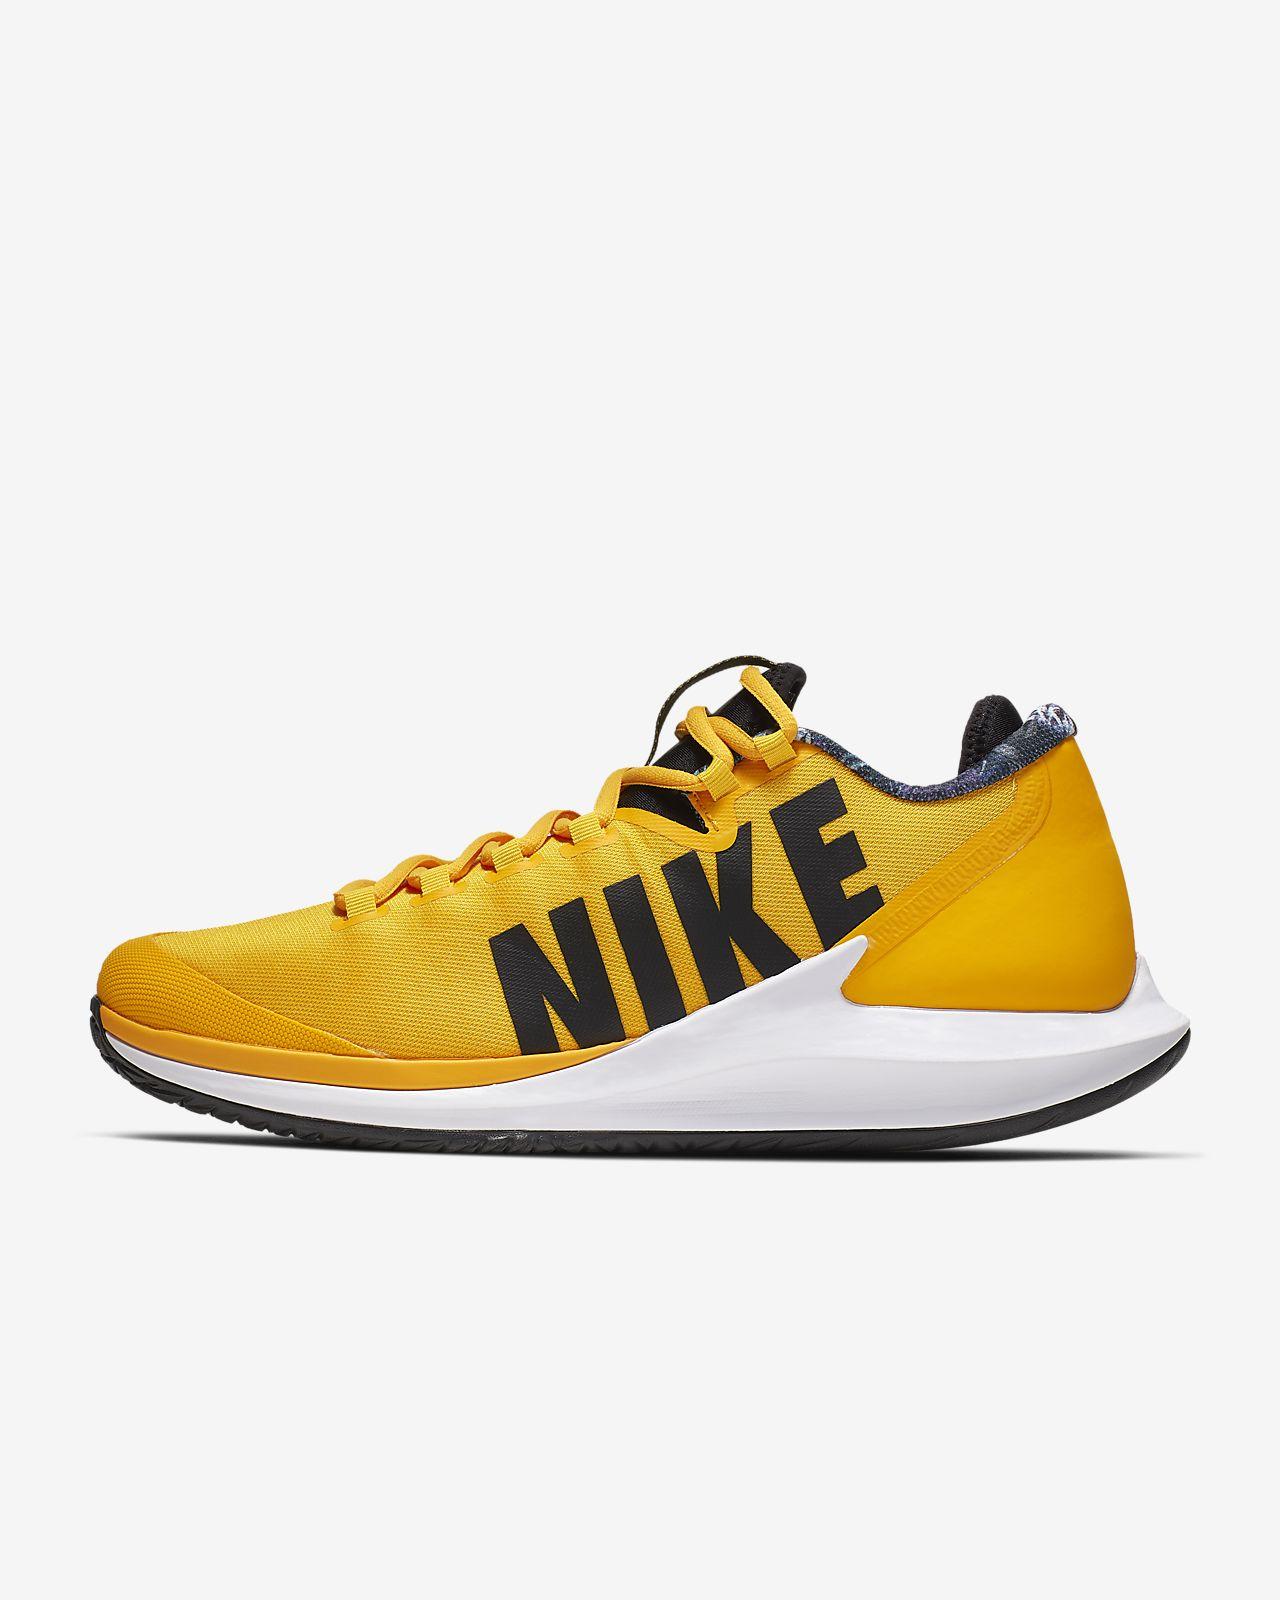 Scarpa da tennis NikeCourt Air Zoom Zero - Uomo